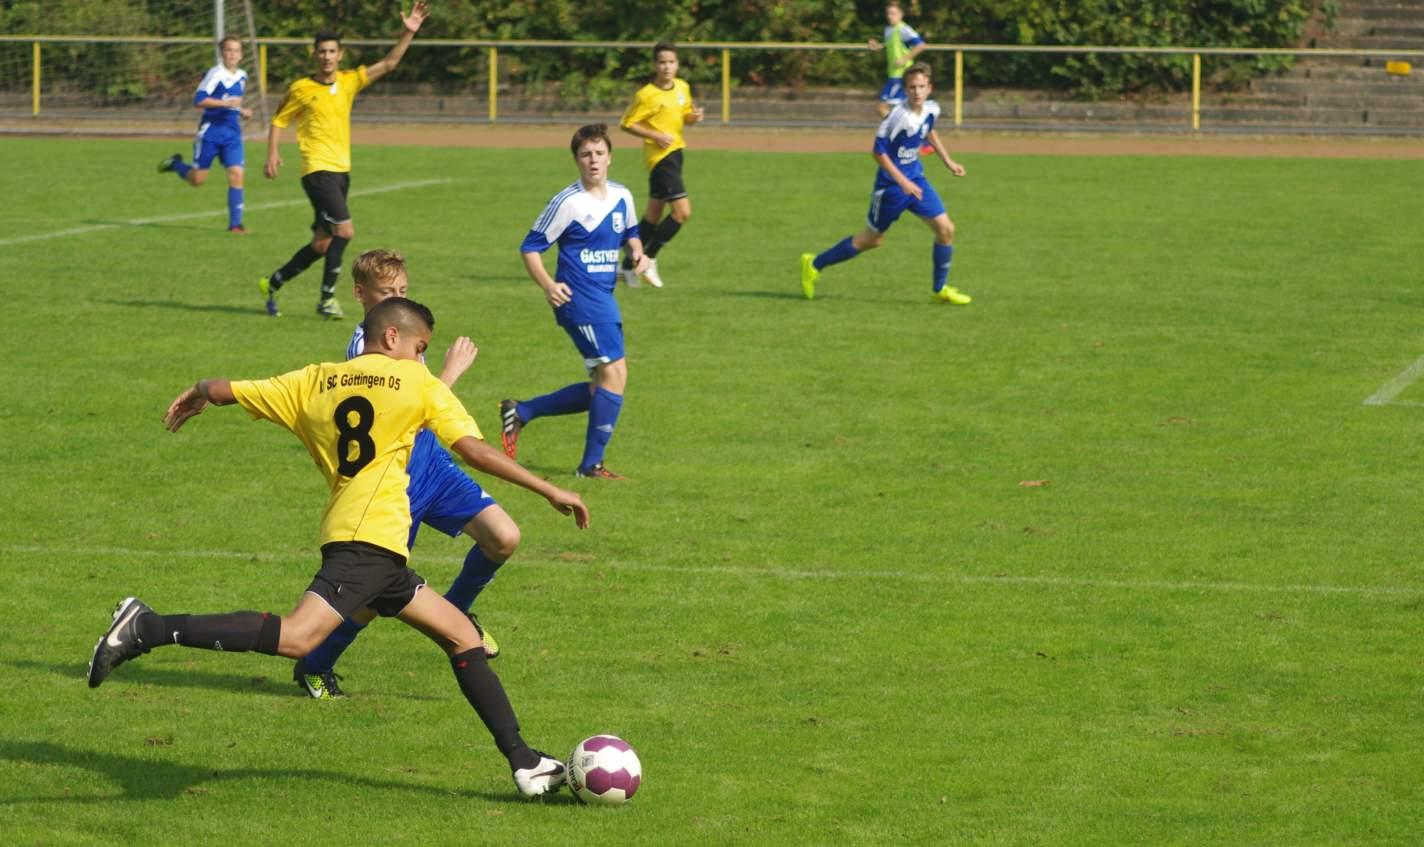 U15 vs FT Braunschweig 07